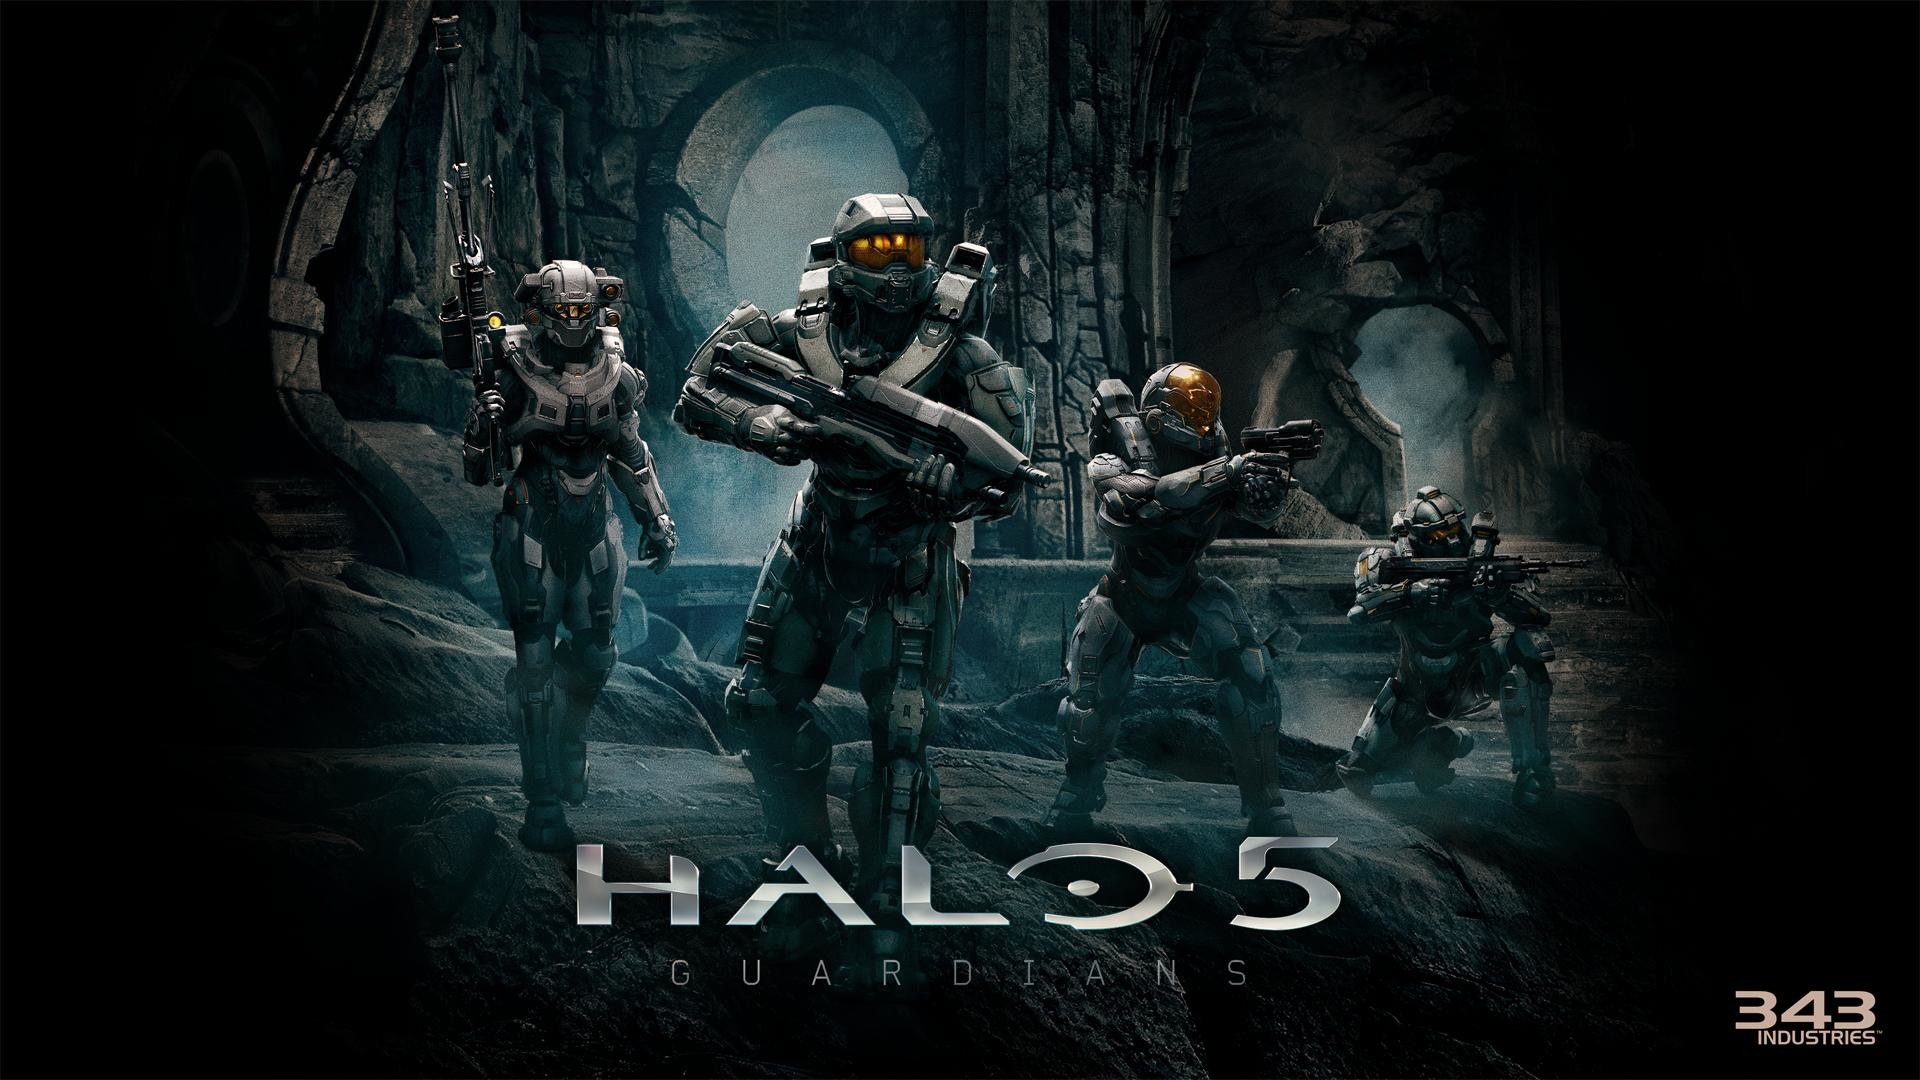 Halo 5 blue team wallpaper 76 images - Halo 5 guardians wallpaper 1920x1080 ...